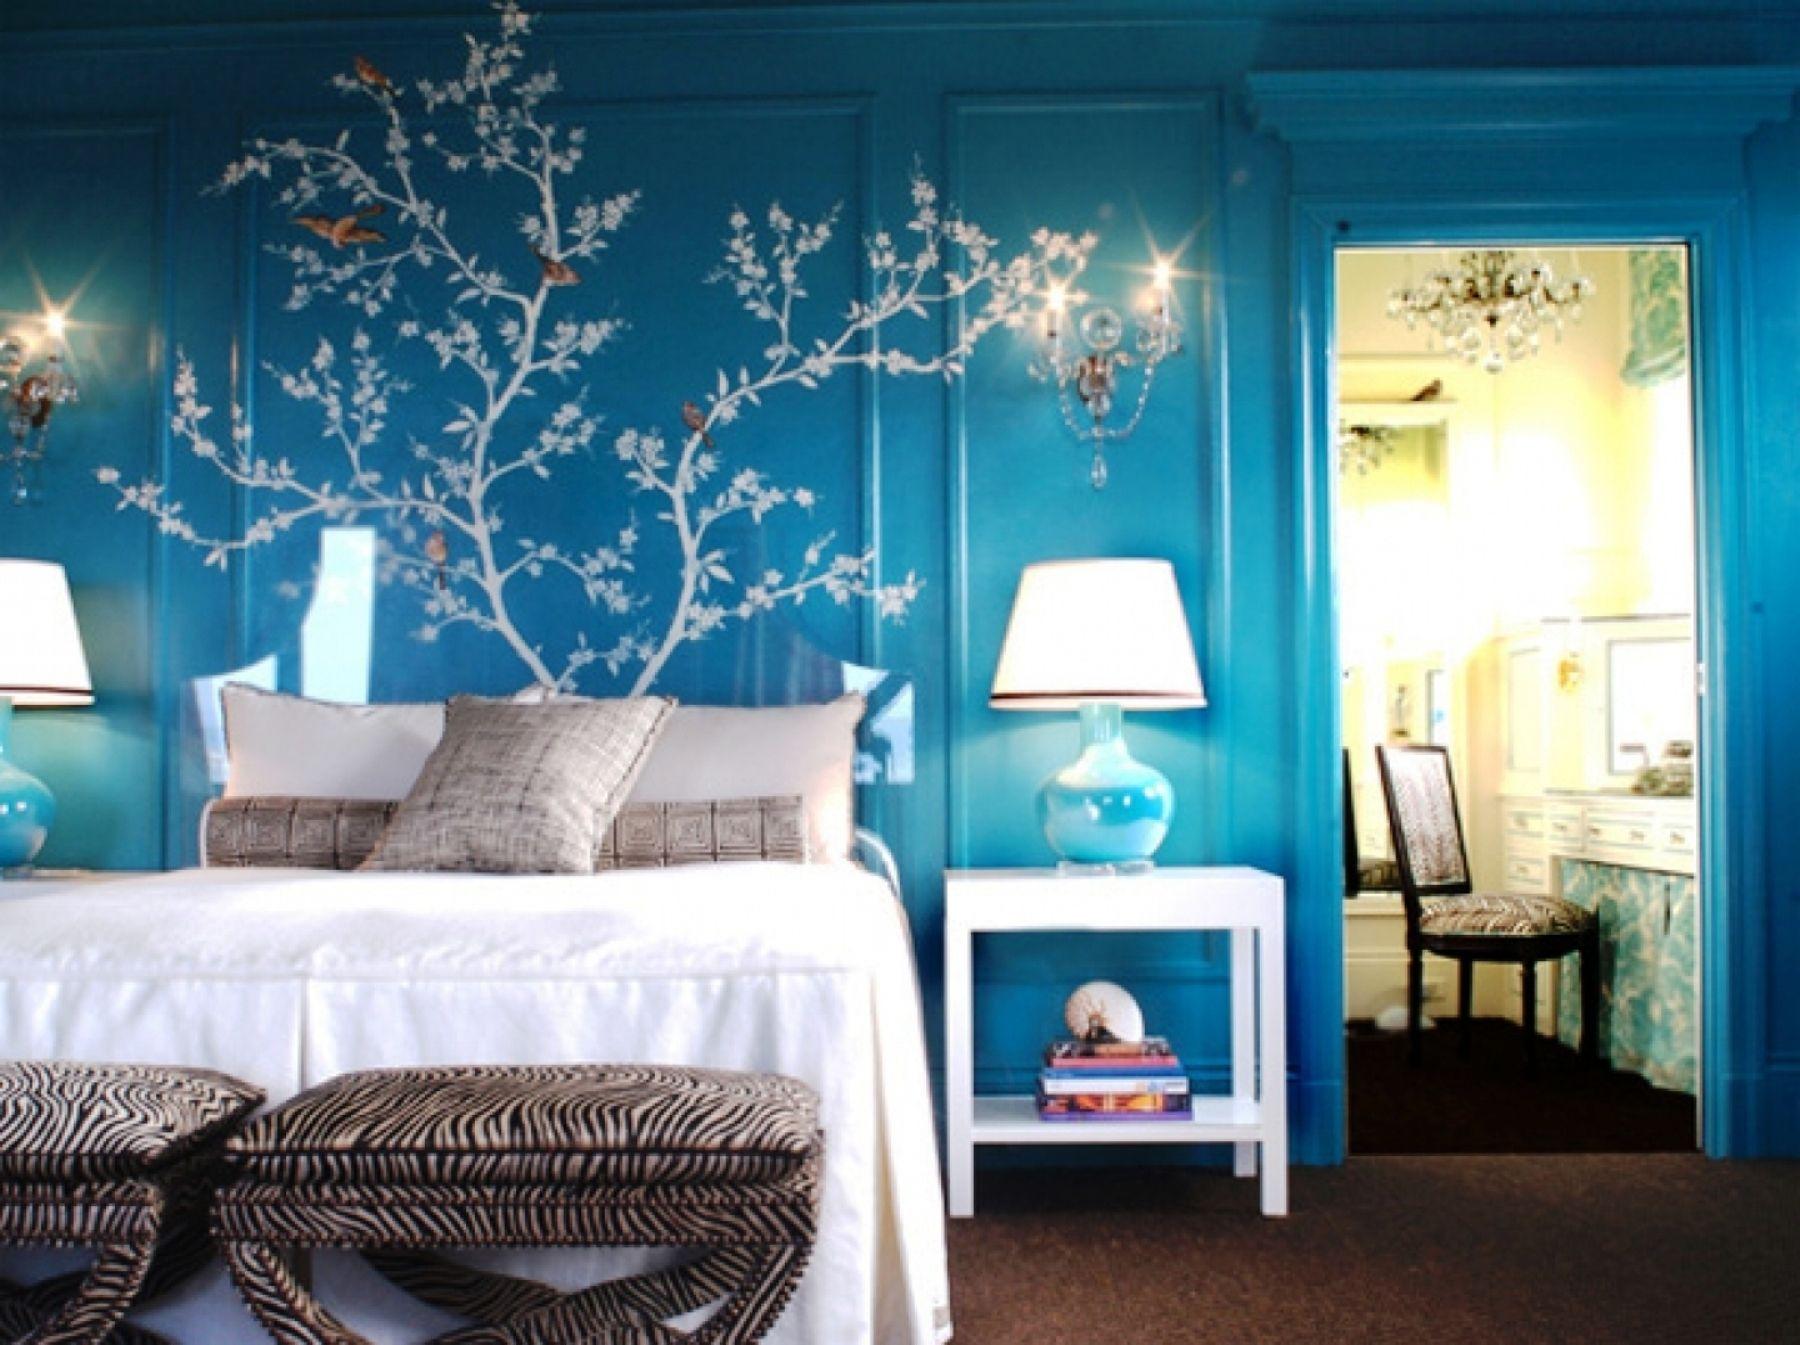 Unique bedroom designs tumblr - Cool Bedrooms For Teenage Girls Tumblr Google Search Room Ideas Pinterest Ragazze Tumblr E Ricerca